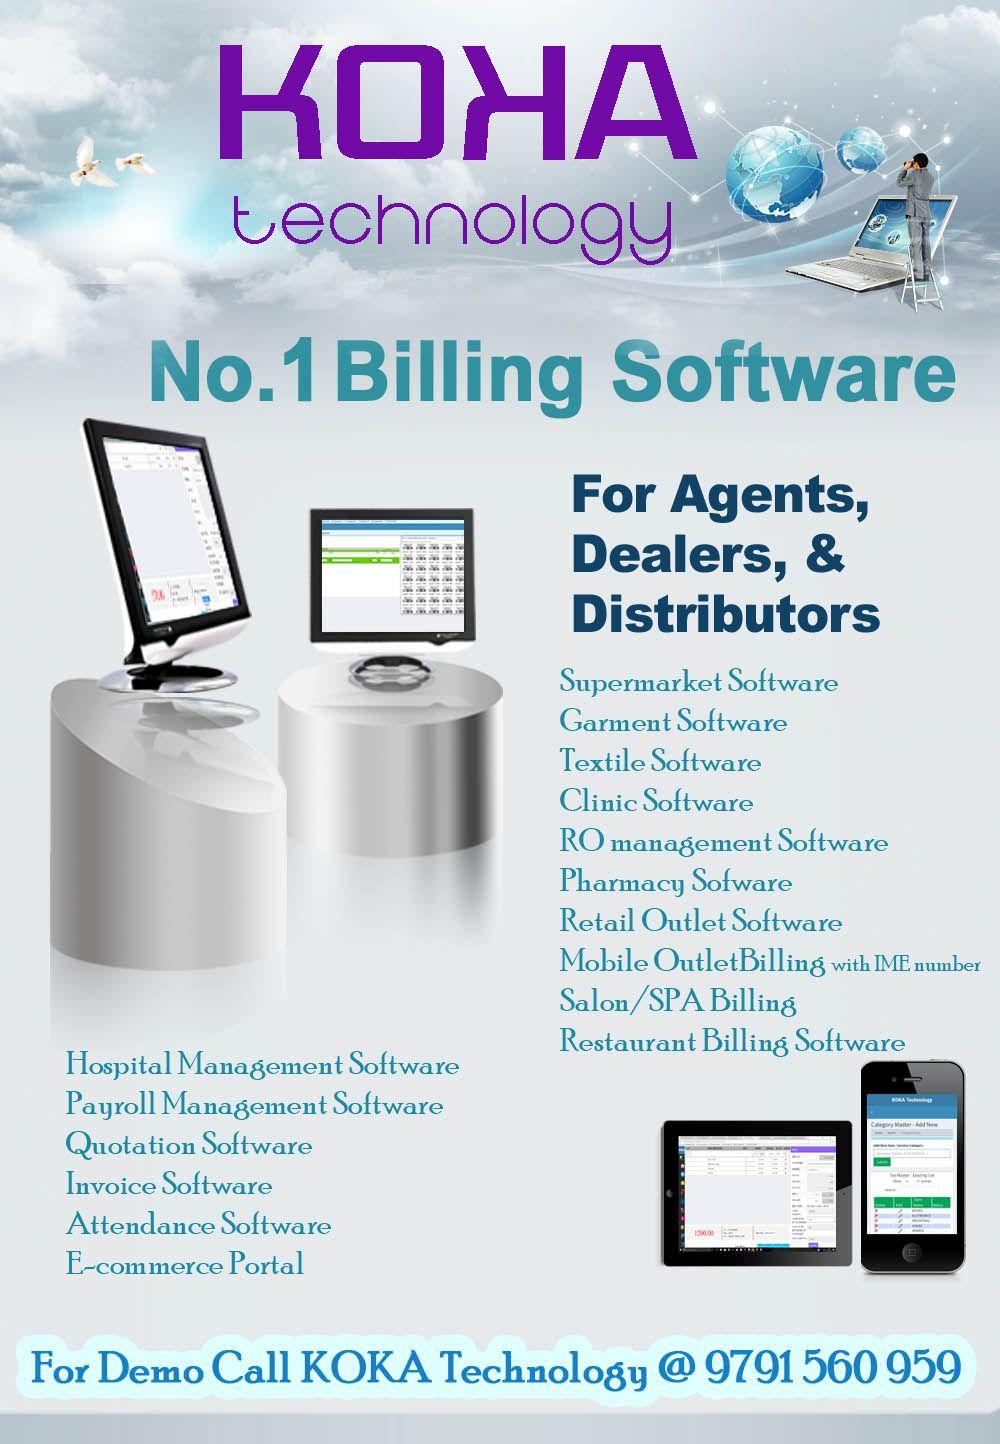 0bbe3a9f9b045c5dbe3ecd379d5e032f - Retail Outlet Dealership Application Portal